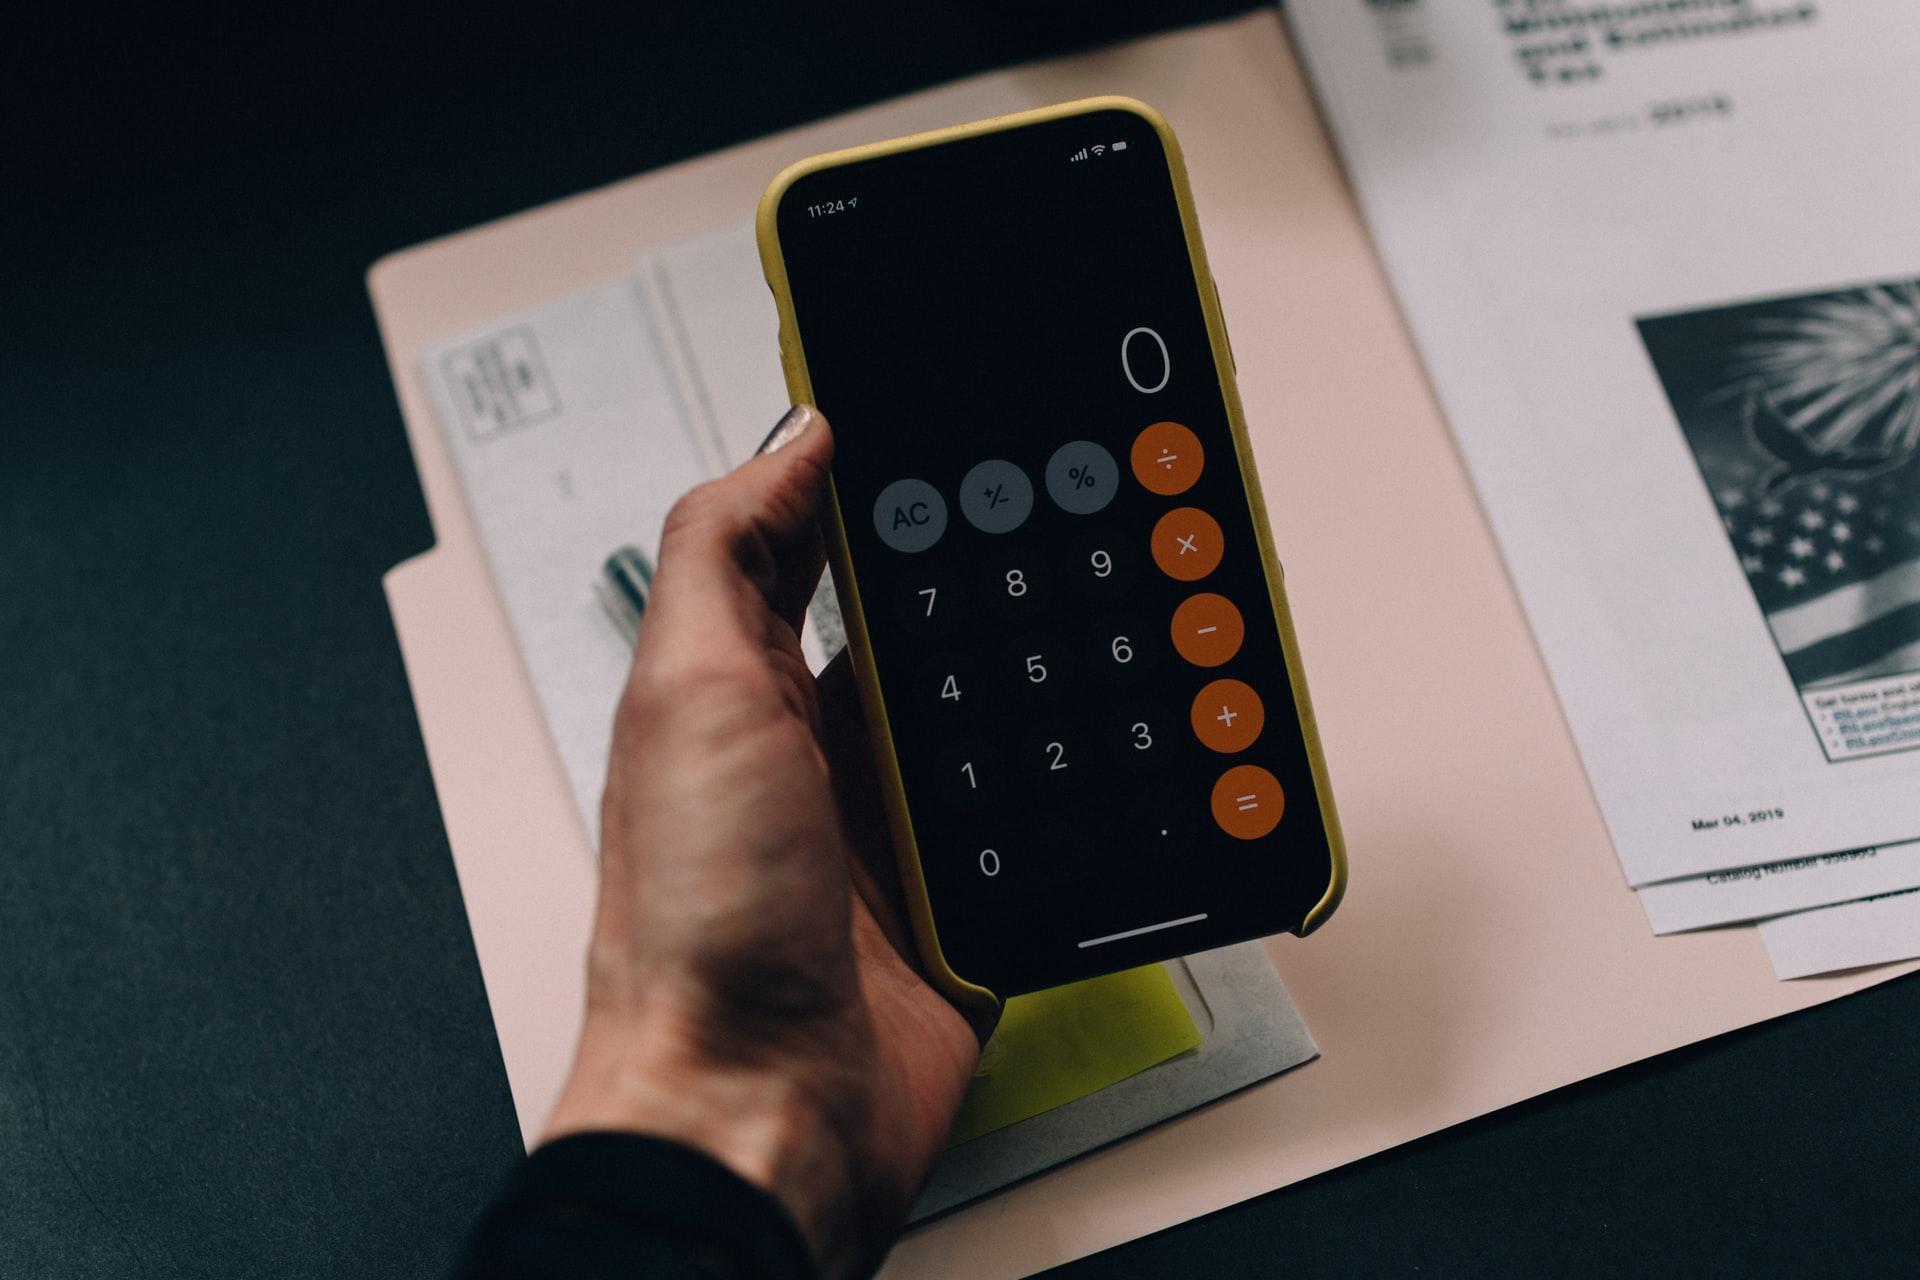 Calculadora do celular